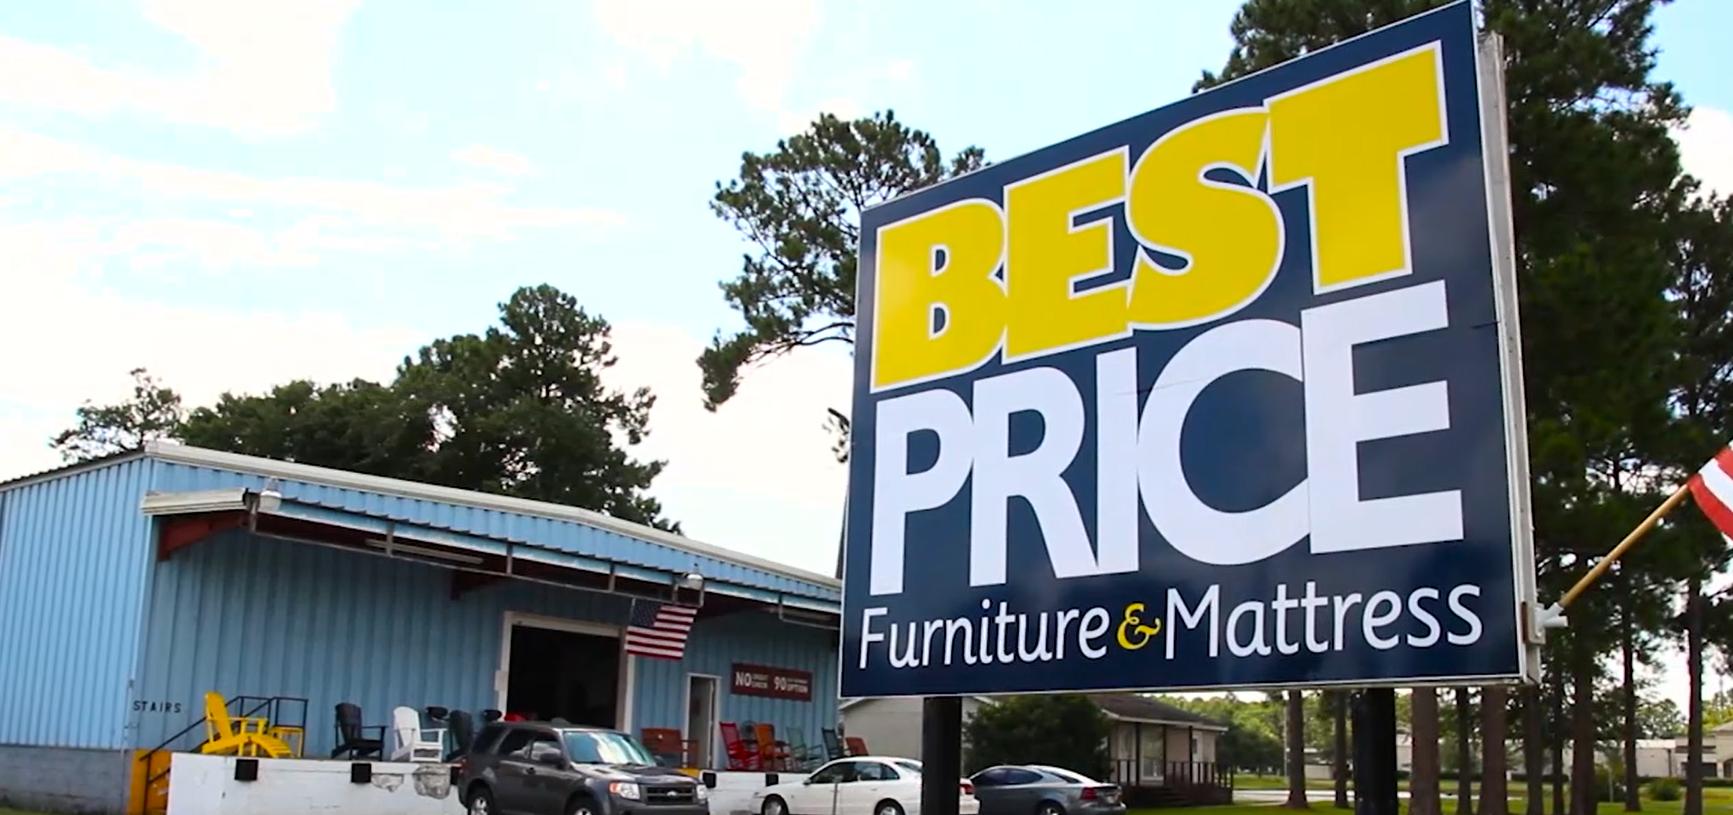 Best Price Furniture Amp Mattress In Fleming Island Fl